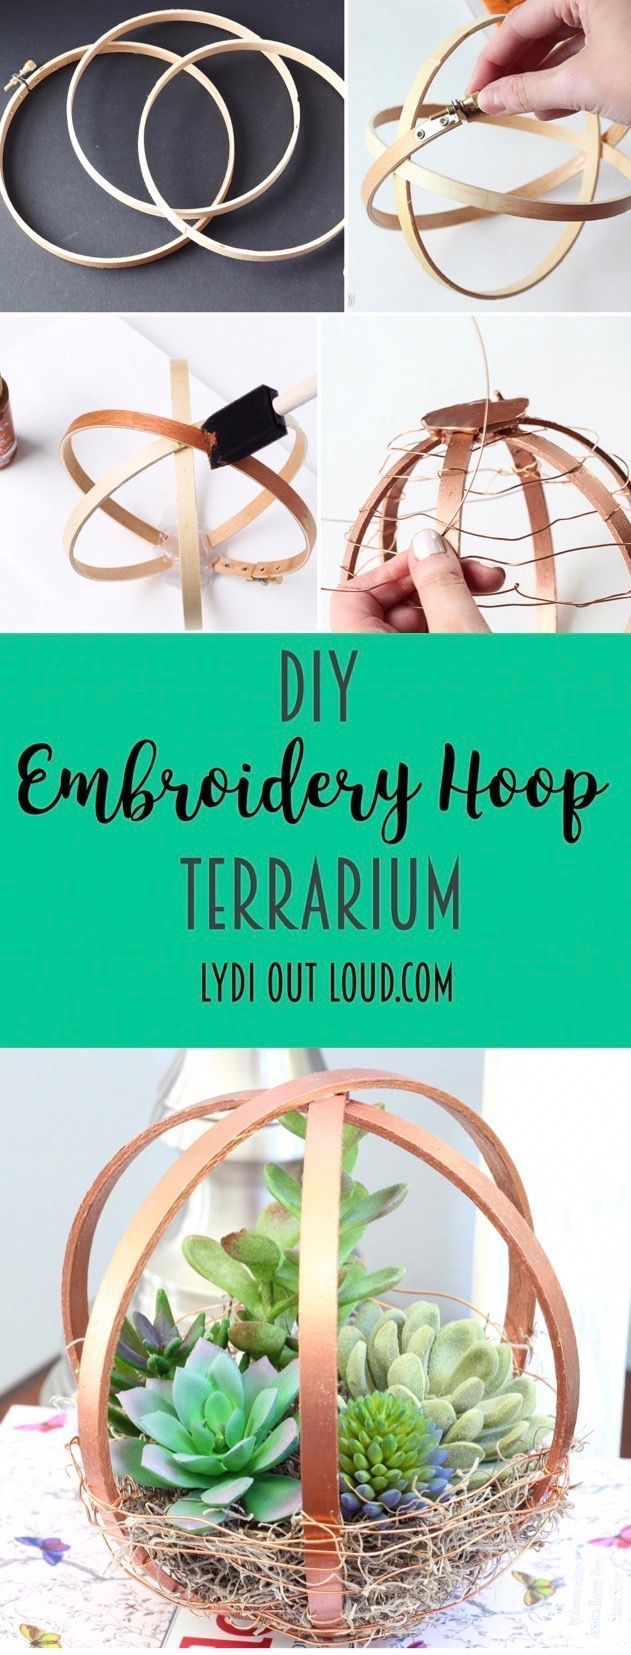 DIY Terrarium with embroidery hoops! #terrarium #succulents #diyhomedecor